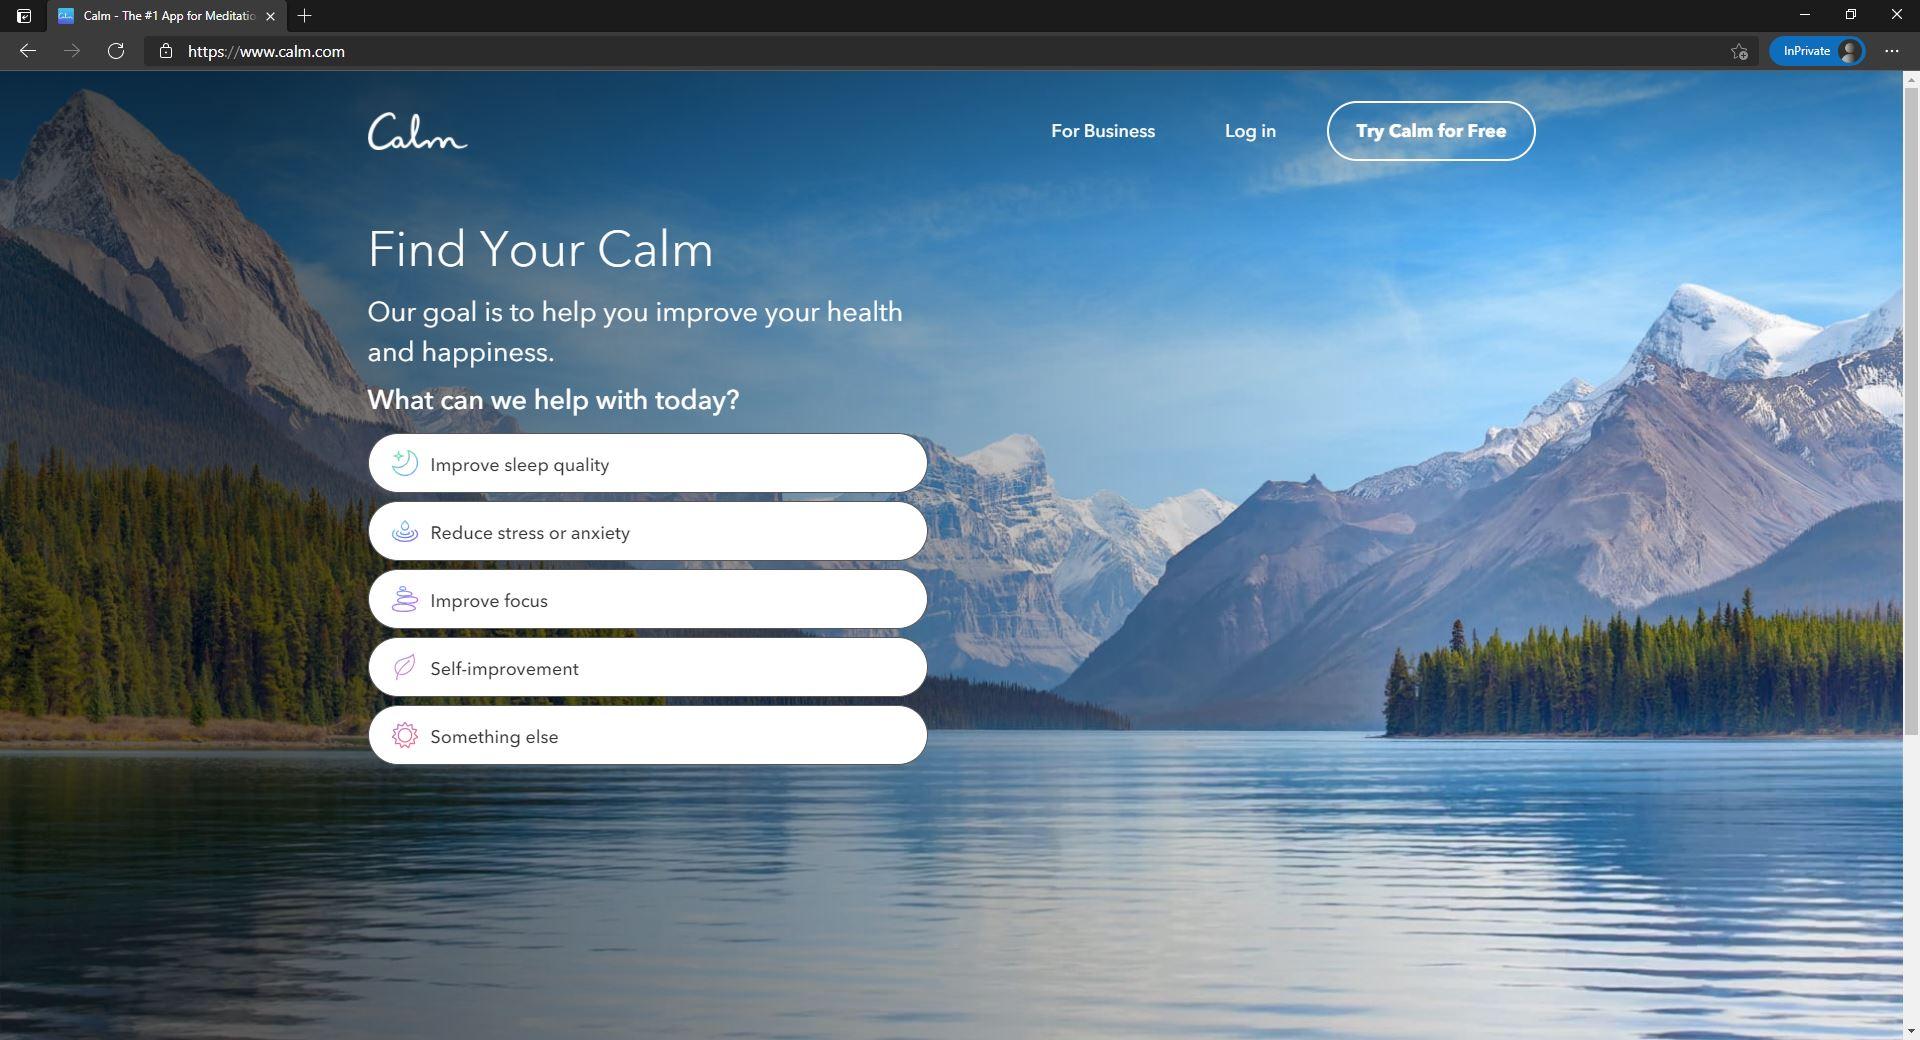 Calm website homepage